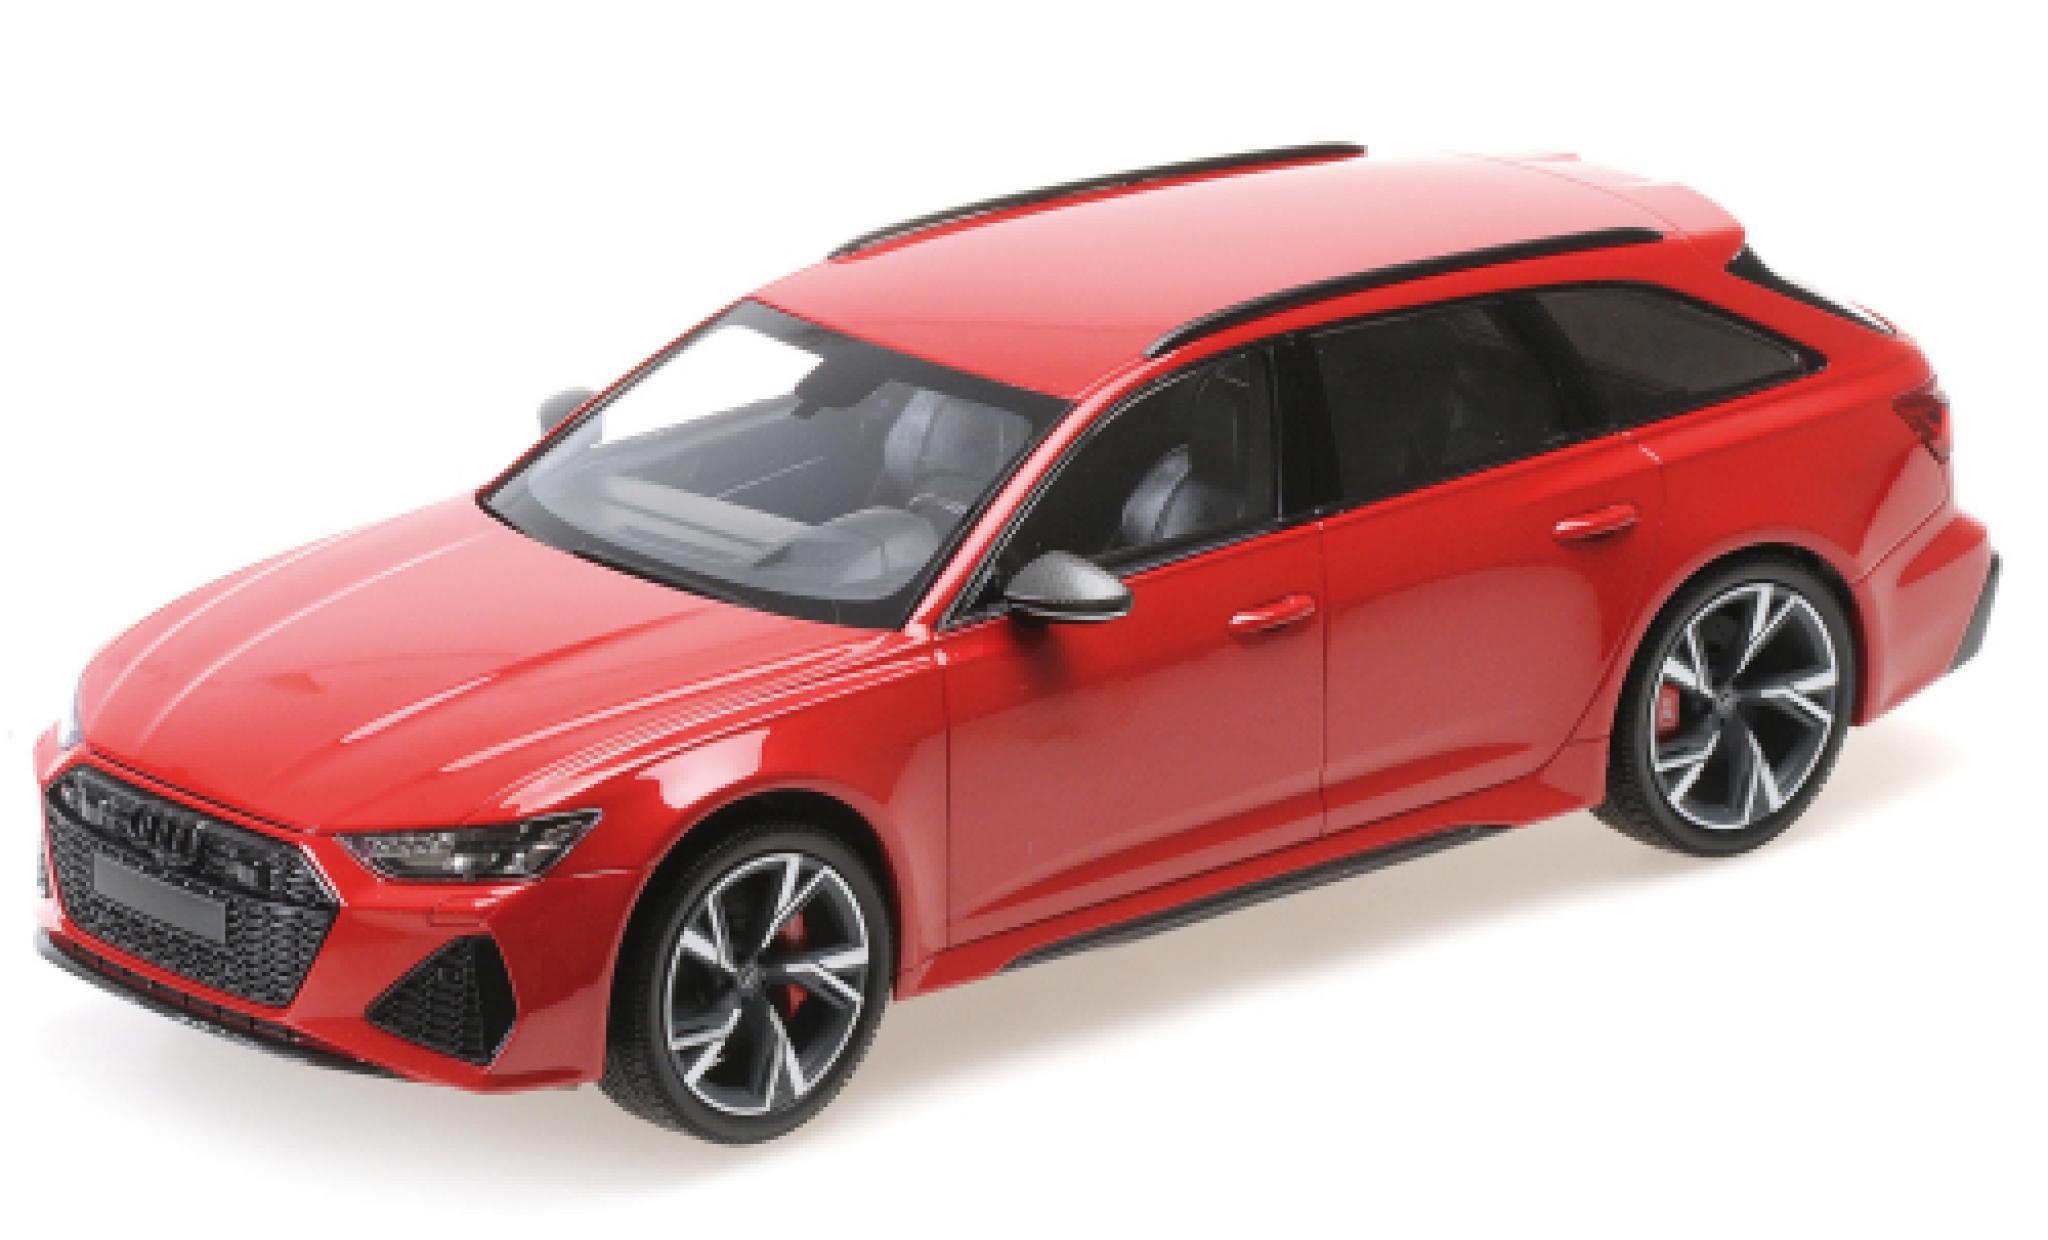 Audi RS6 1/18 Minichamps Avant metallise red 2019